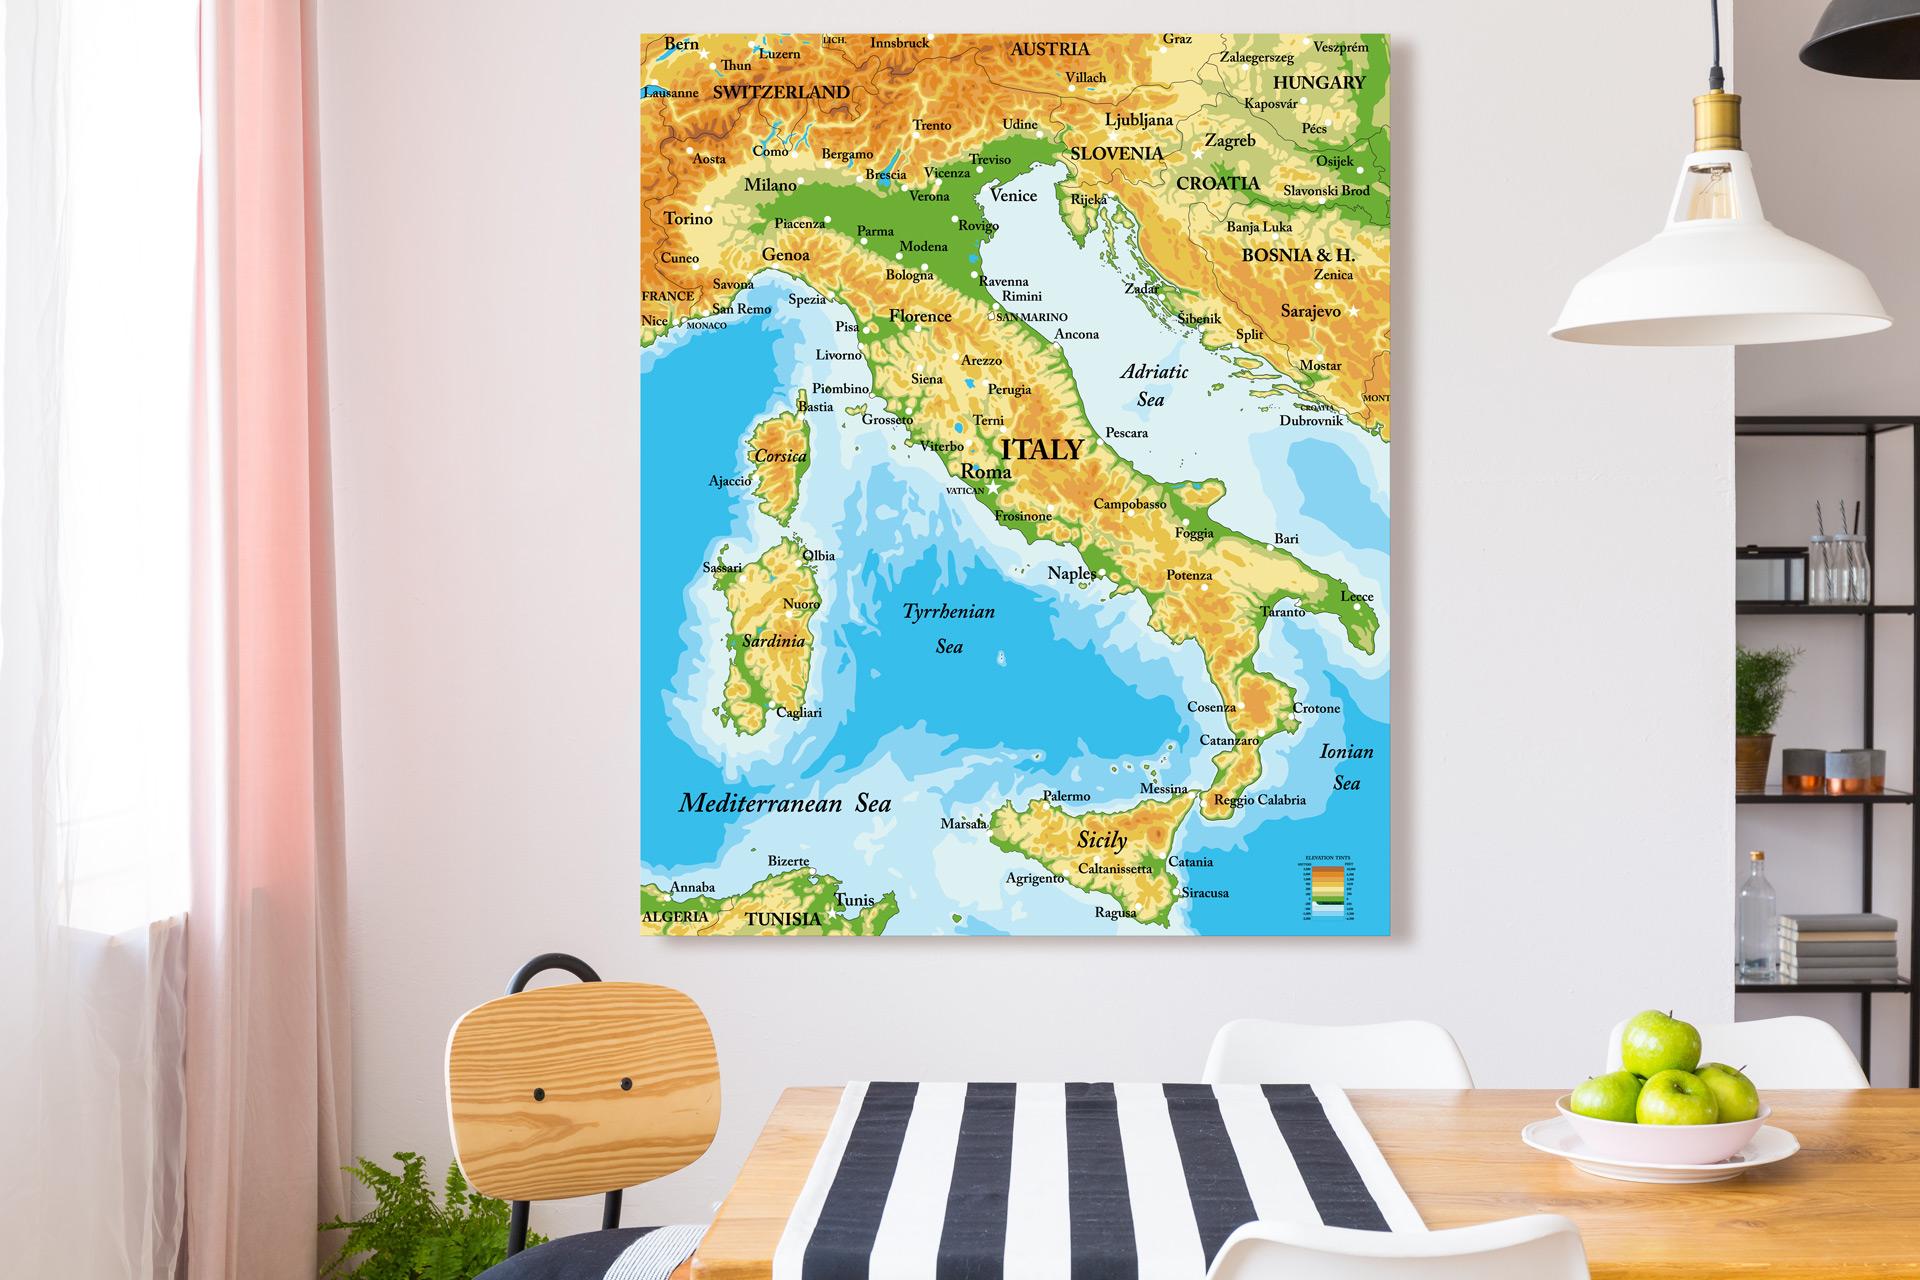 Cartina Italiana Dettagliata.Mappa D Italia Dettagliata Cartina Italiana Scegli Tra 13 Modelli